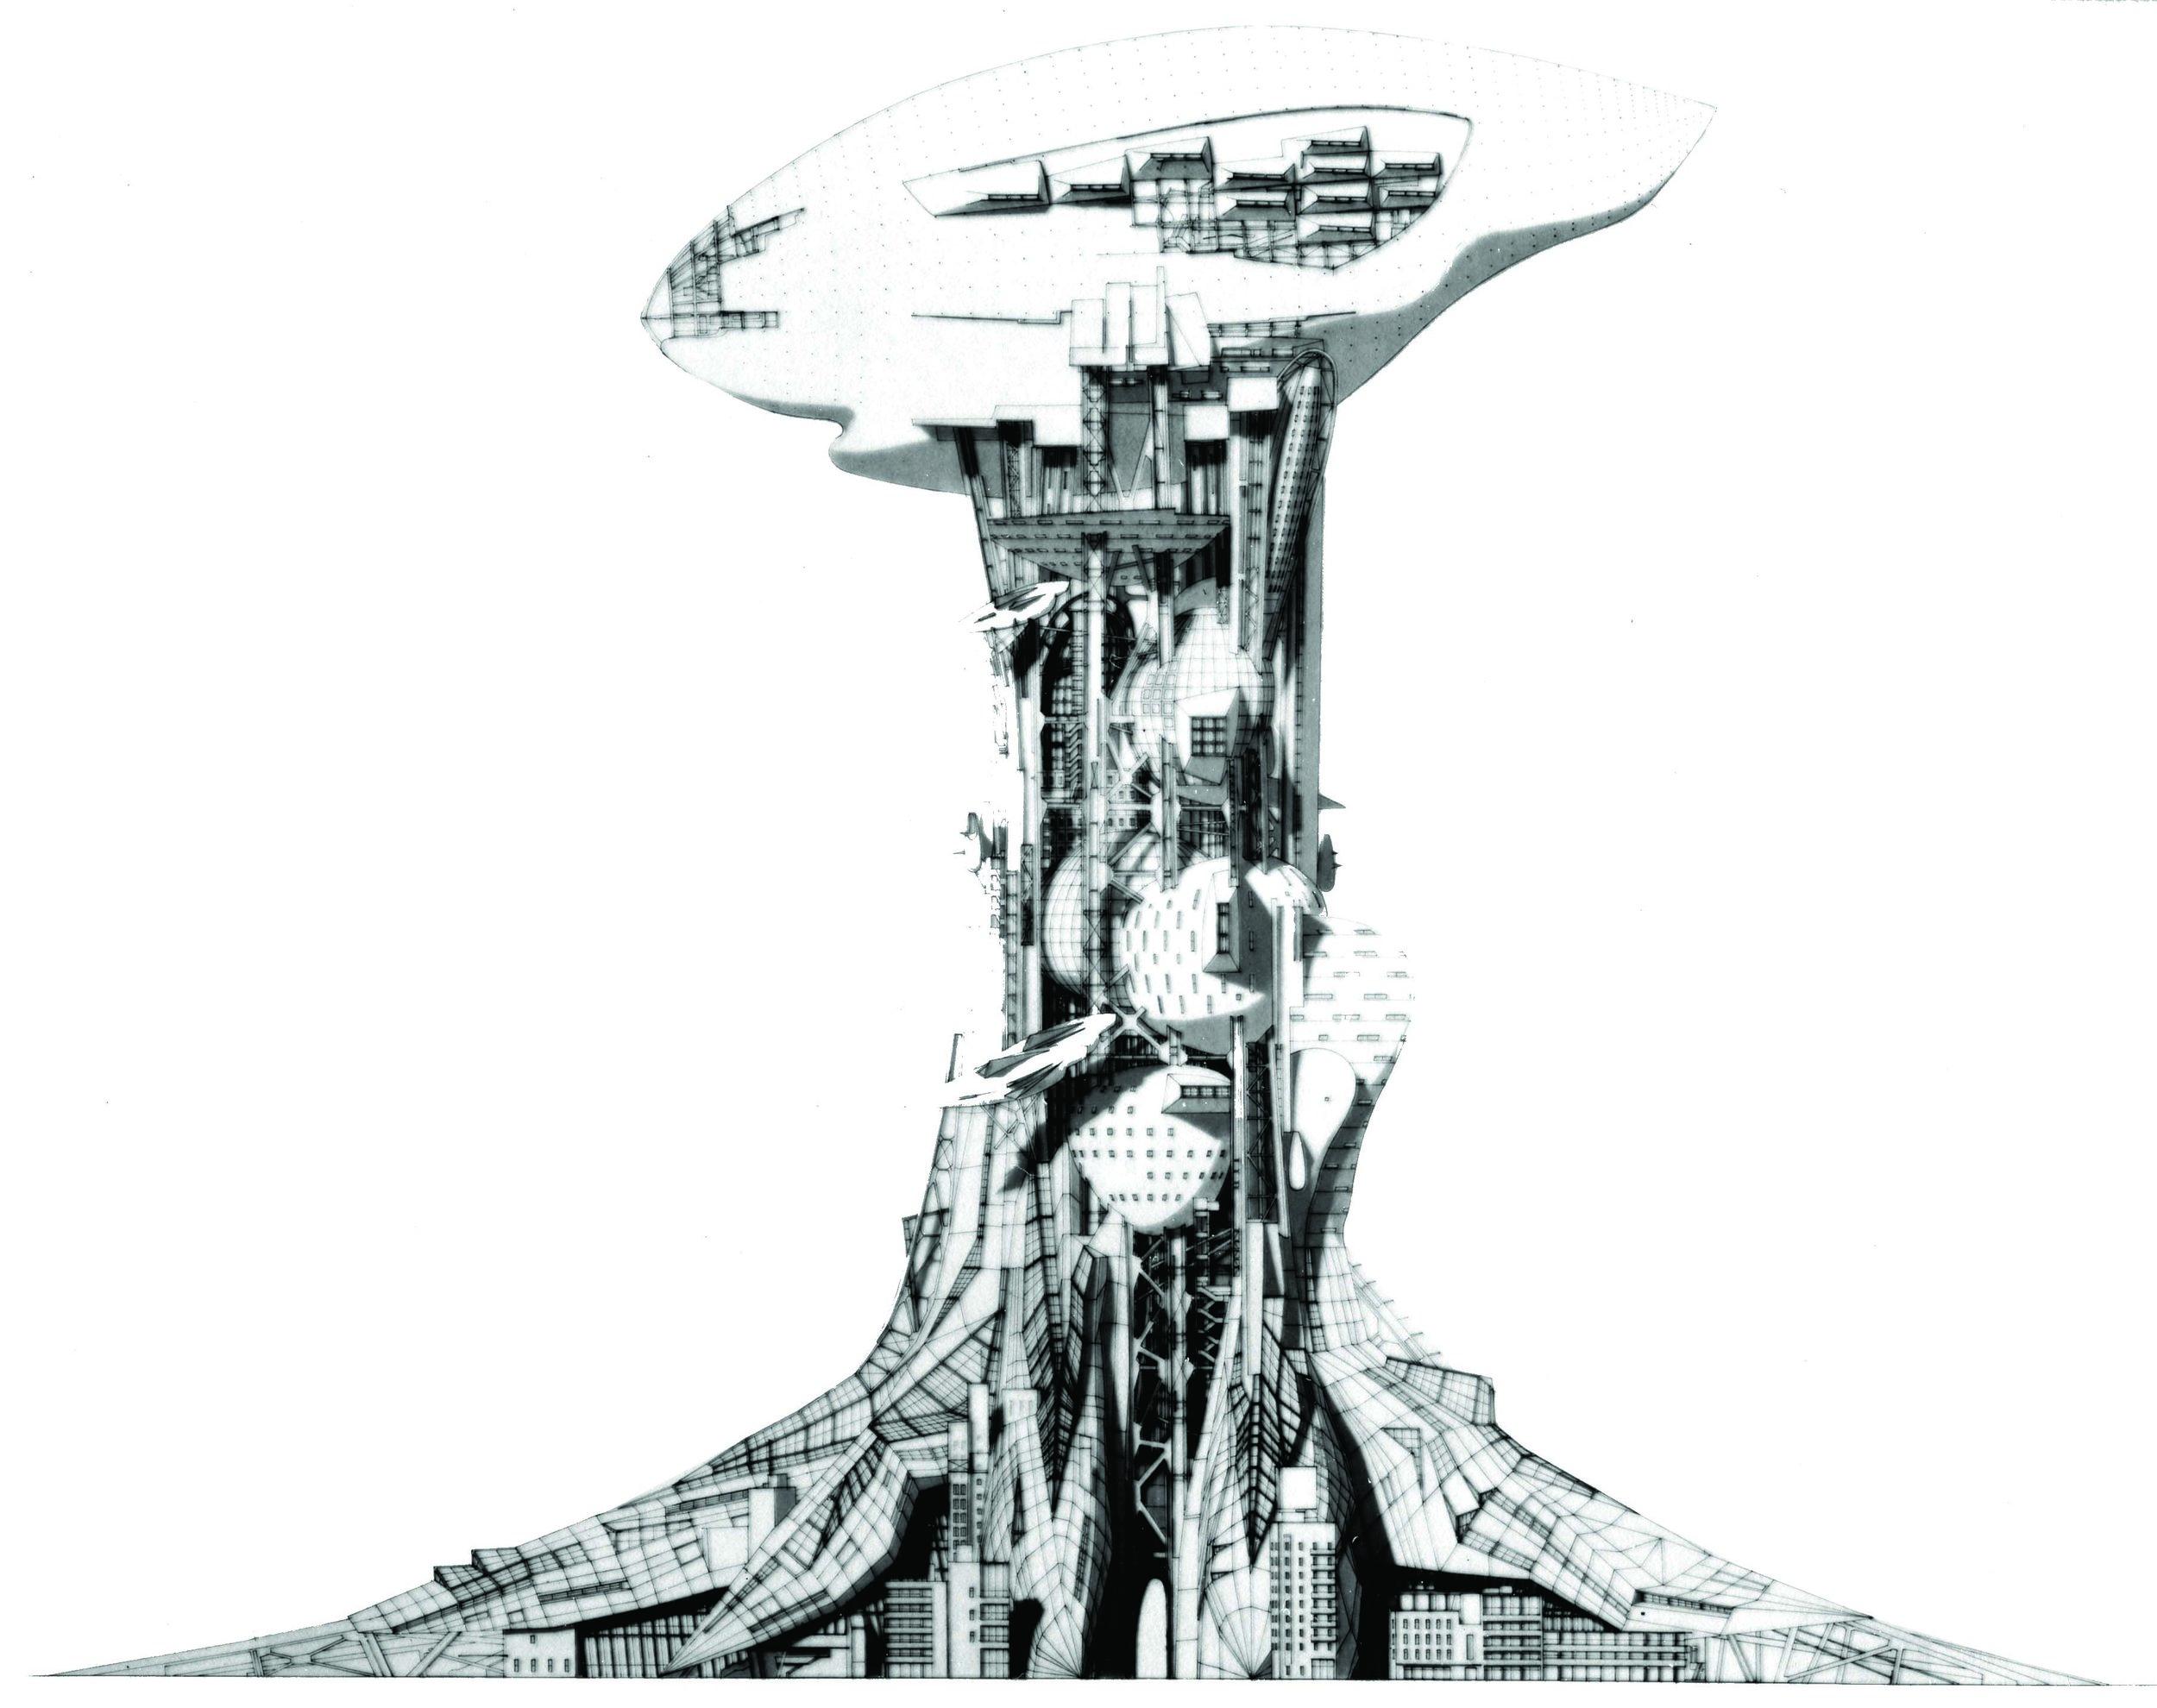 Godzilla_Elevation 2.jpg